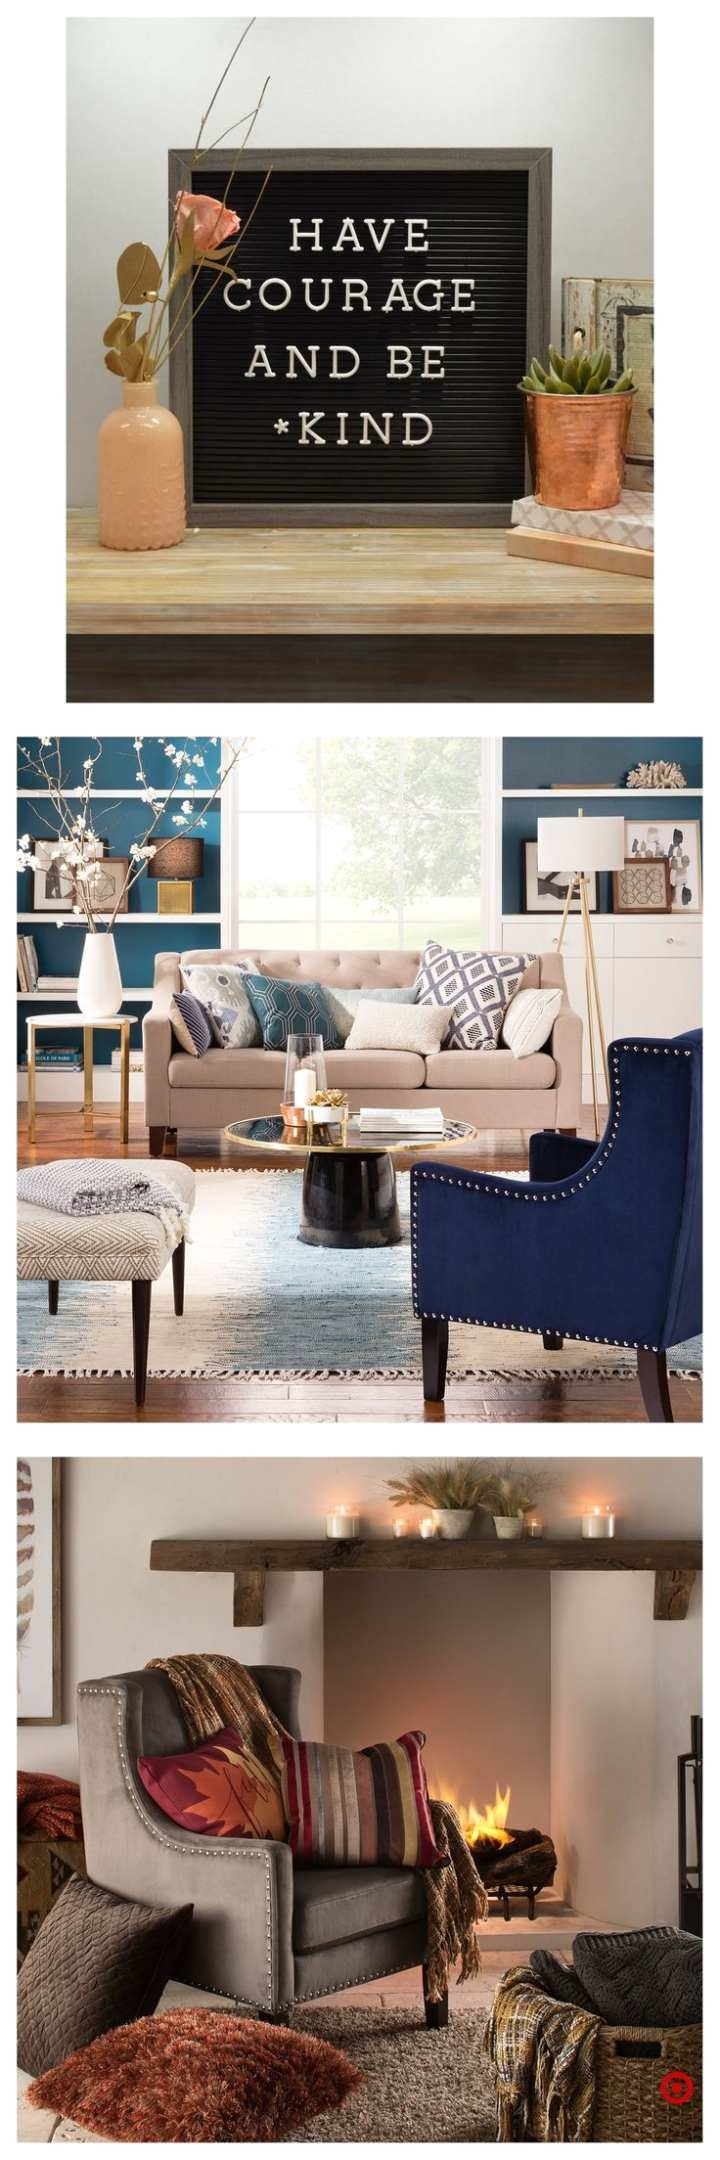 Donate Furniture Pick Up 29 Distinctive sofa Donation Pick Up Image sofa Furniture